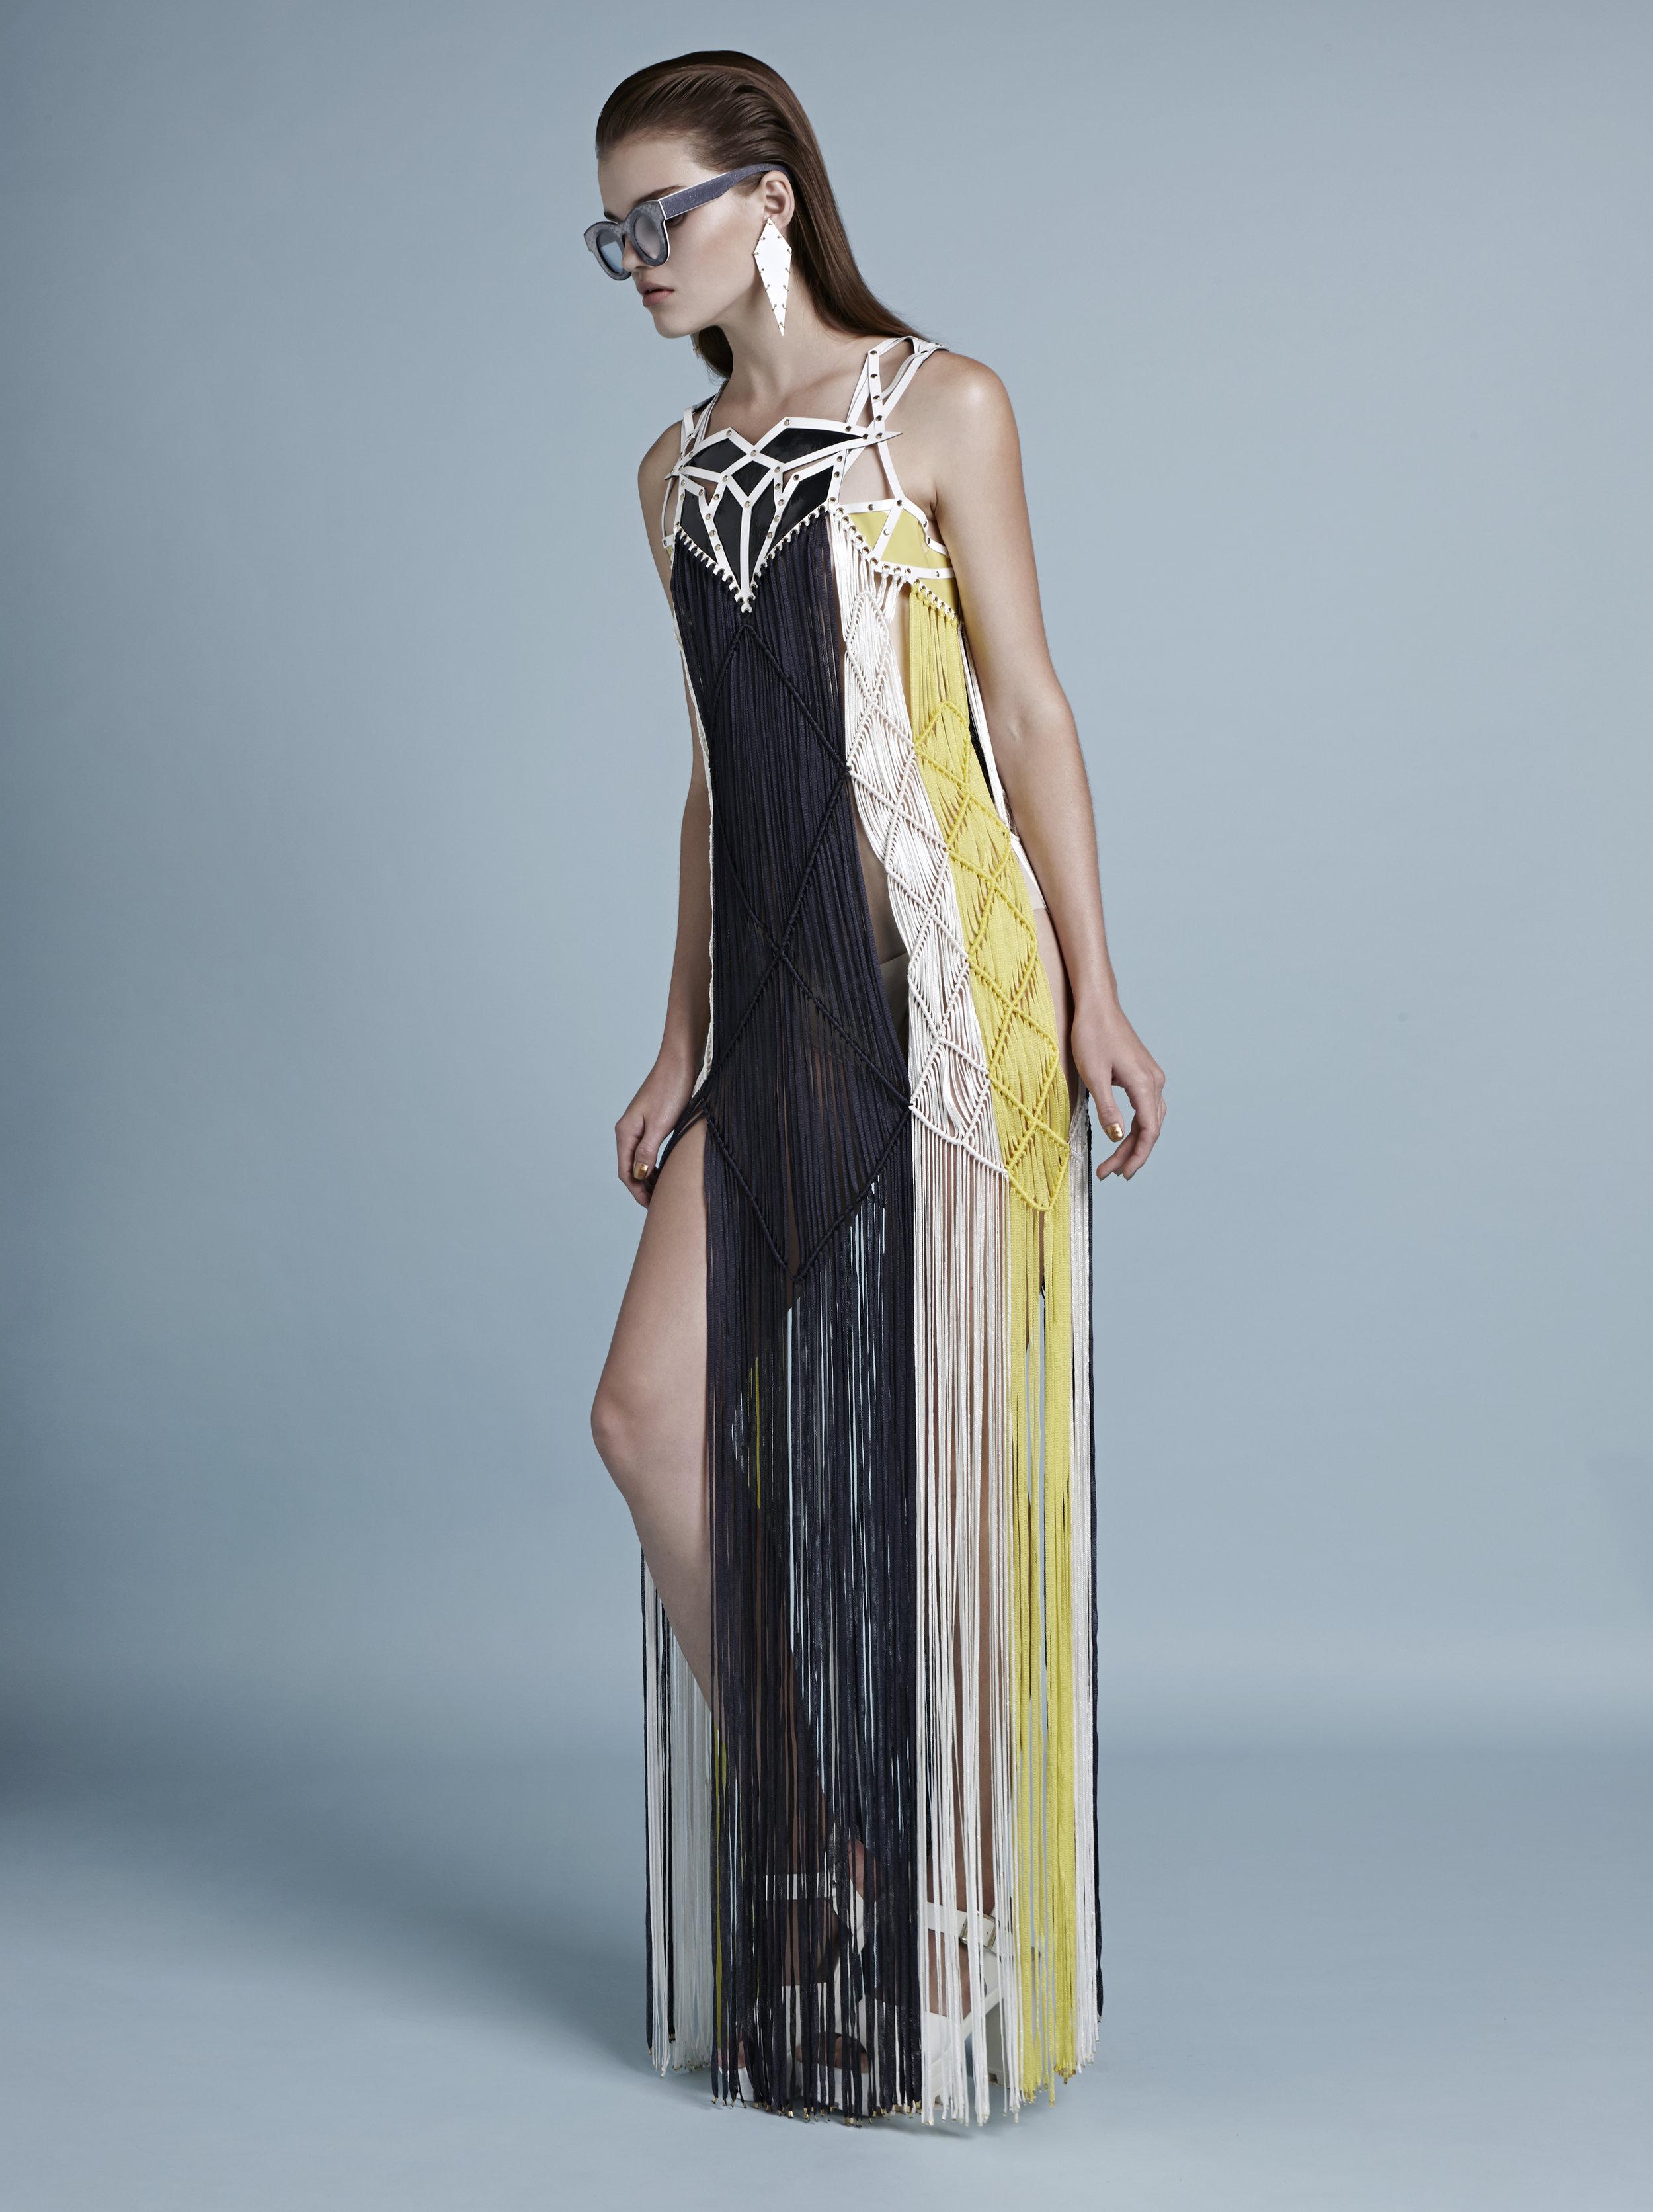 JaneBowler SS15 dress.jpg